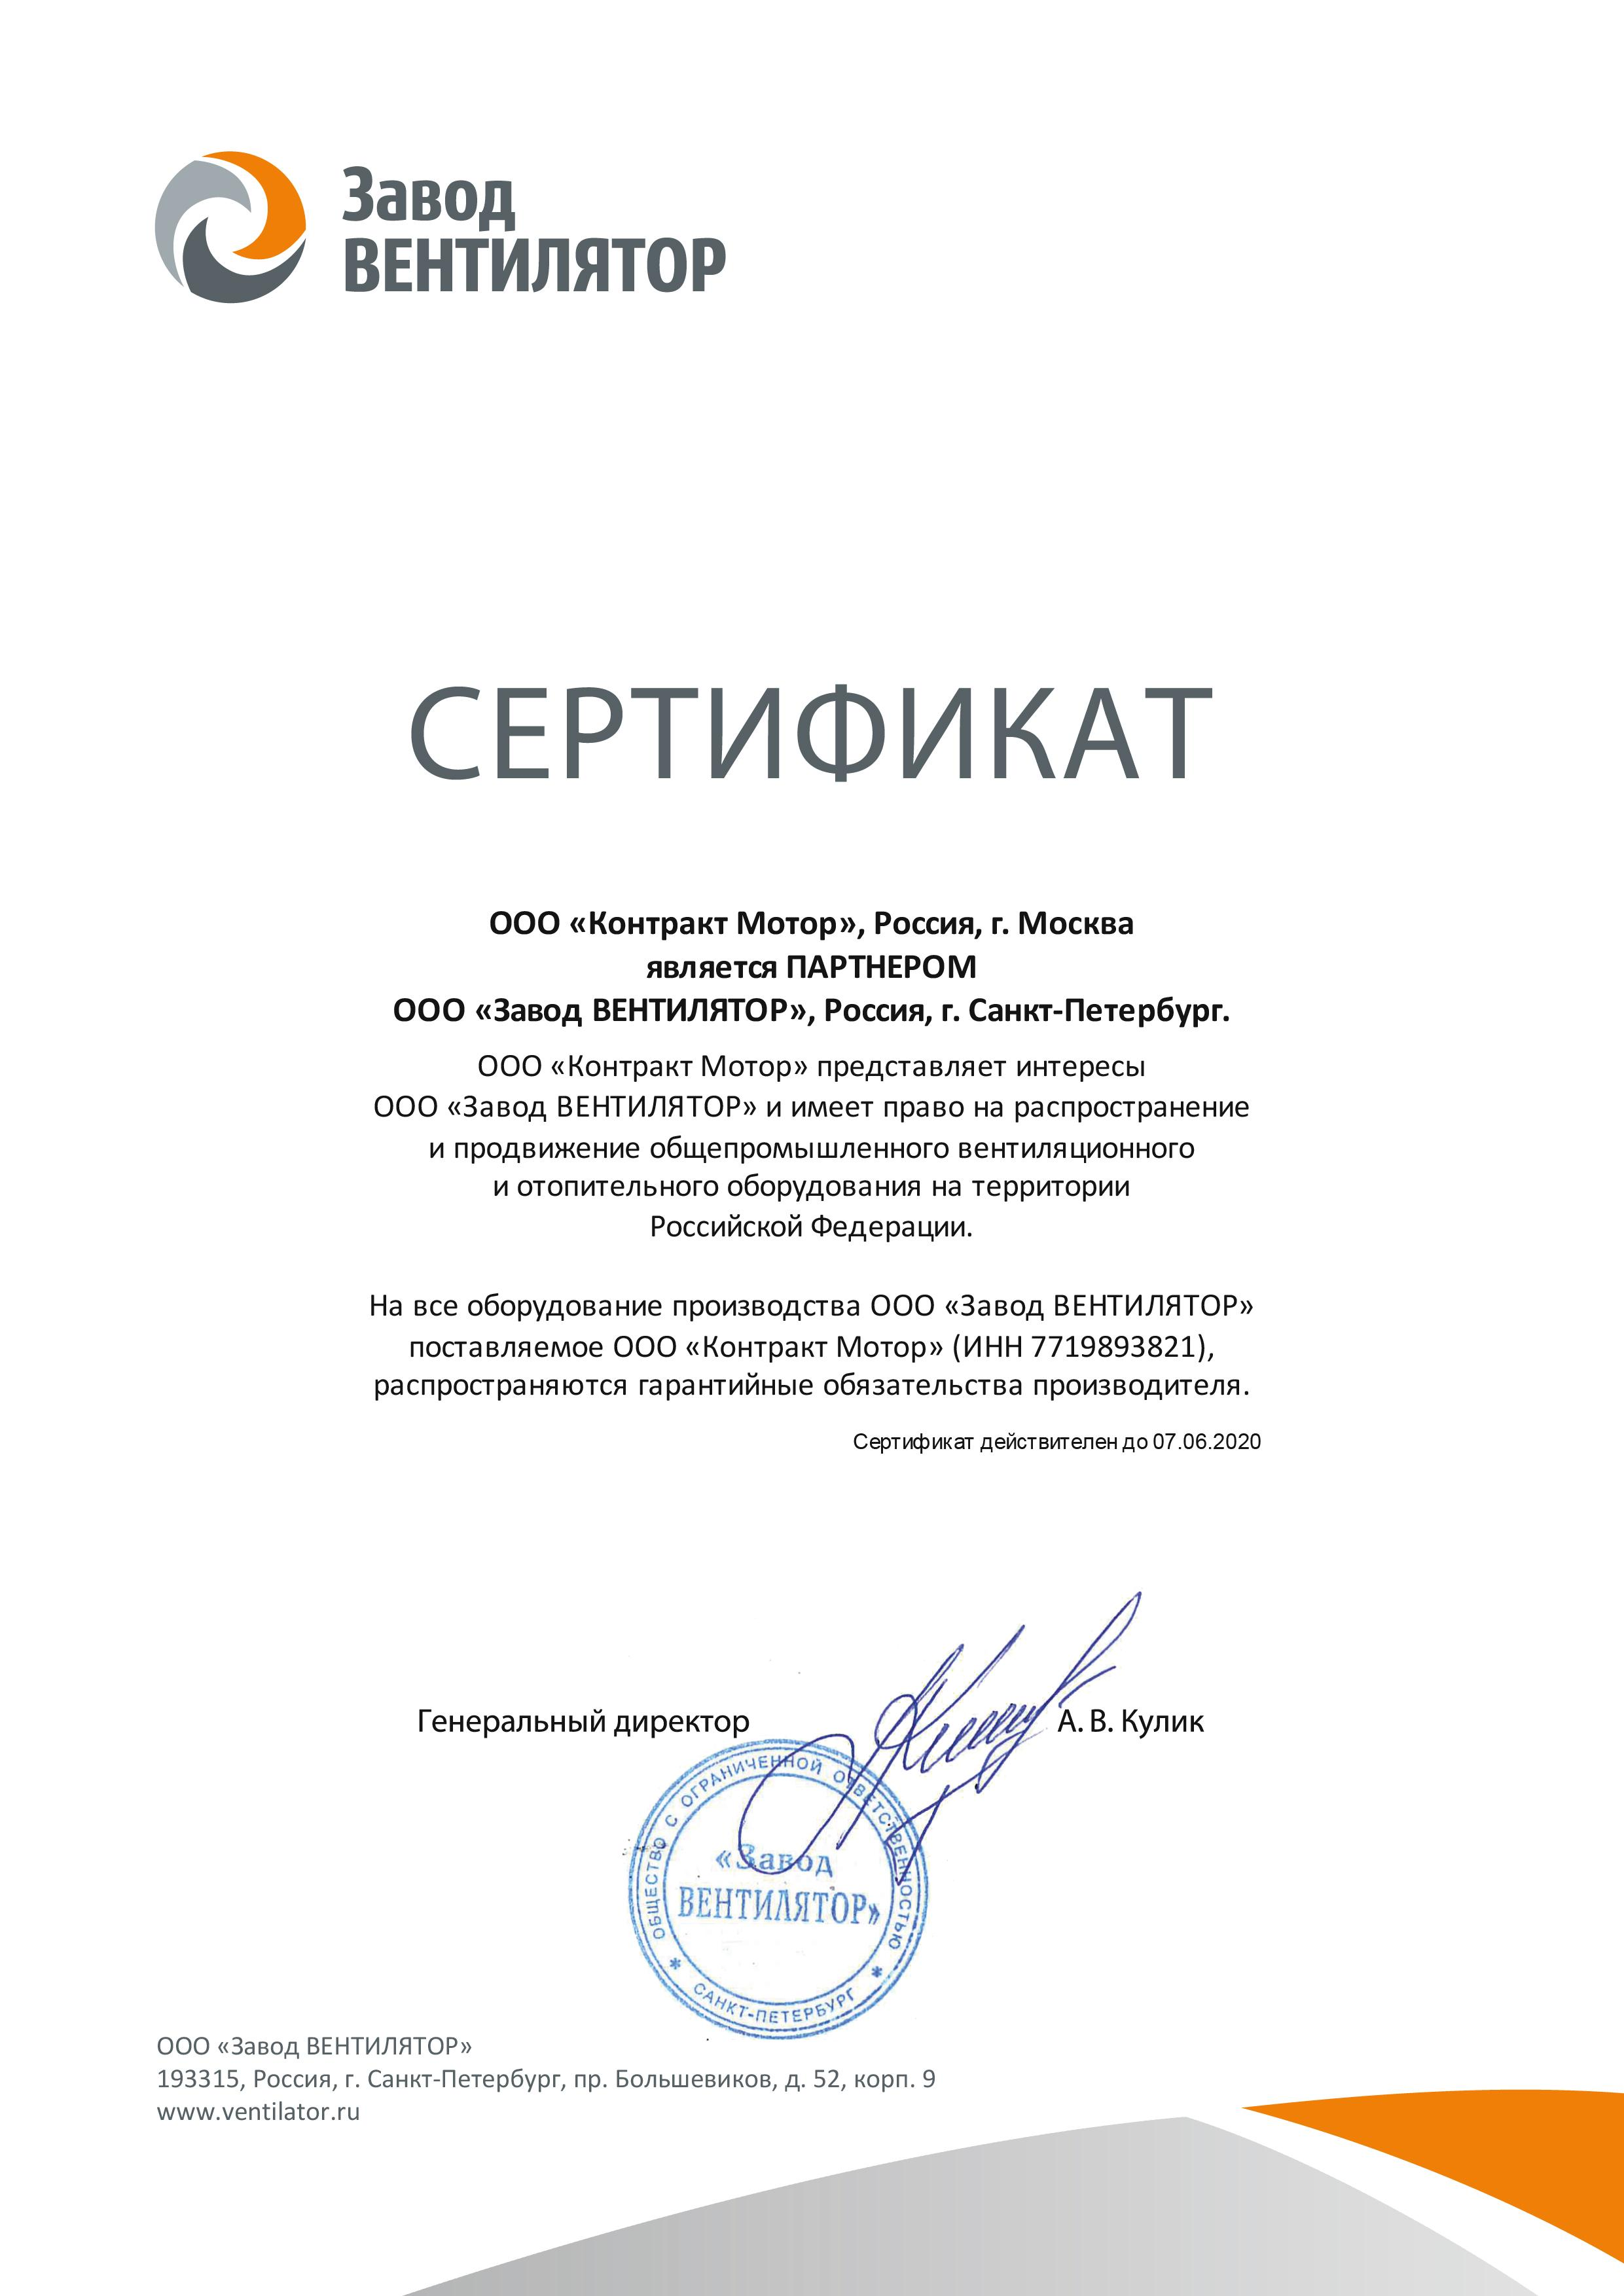 Сертификат ООО «Завод ВЕНТИЛЯТОР»